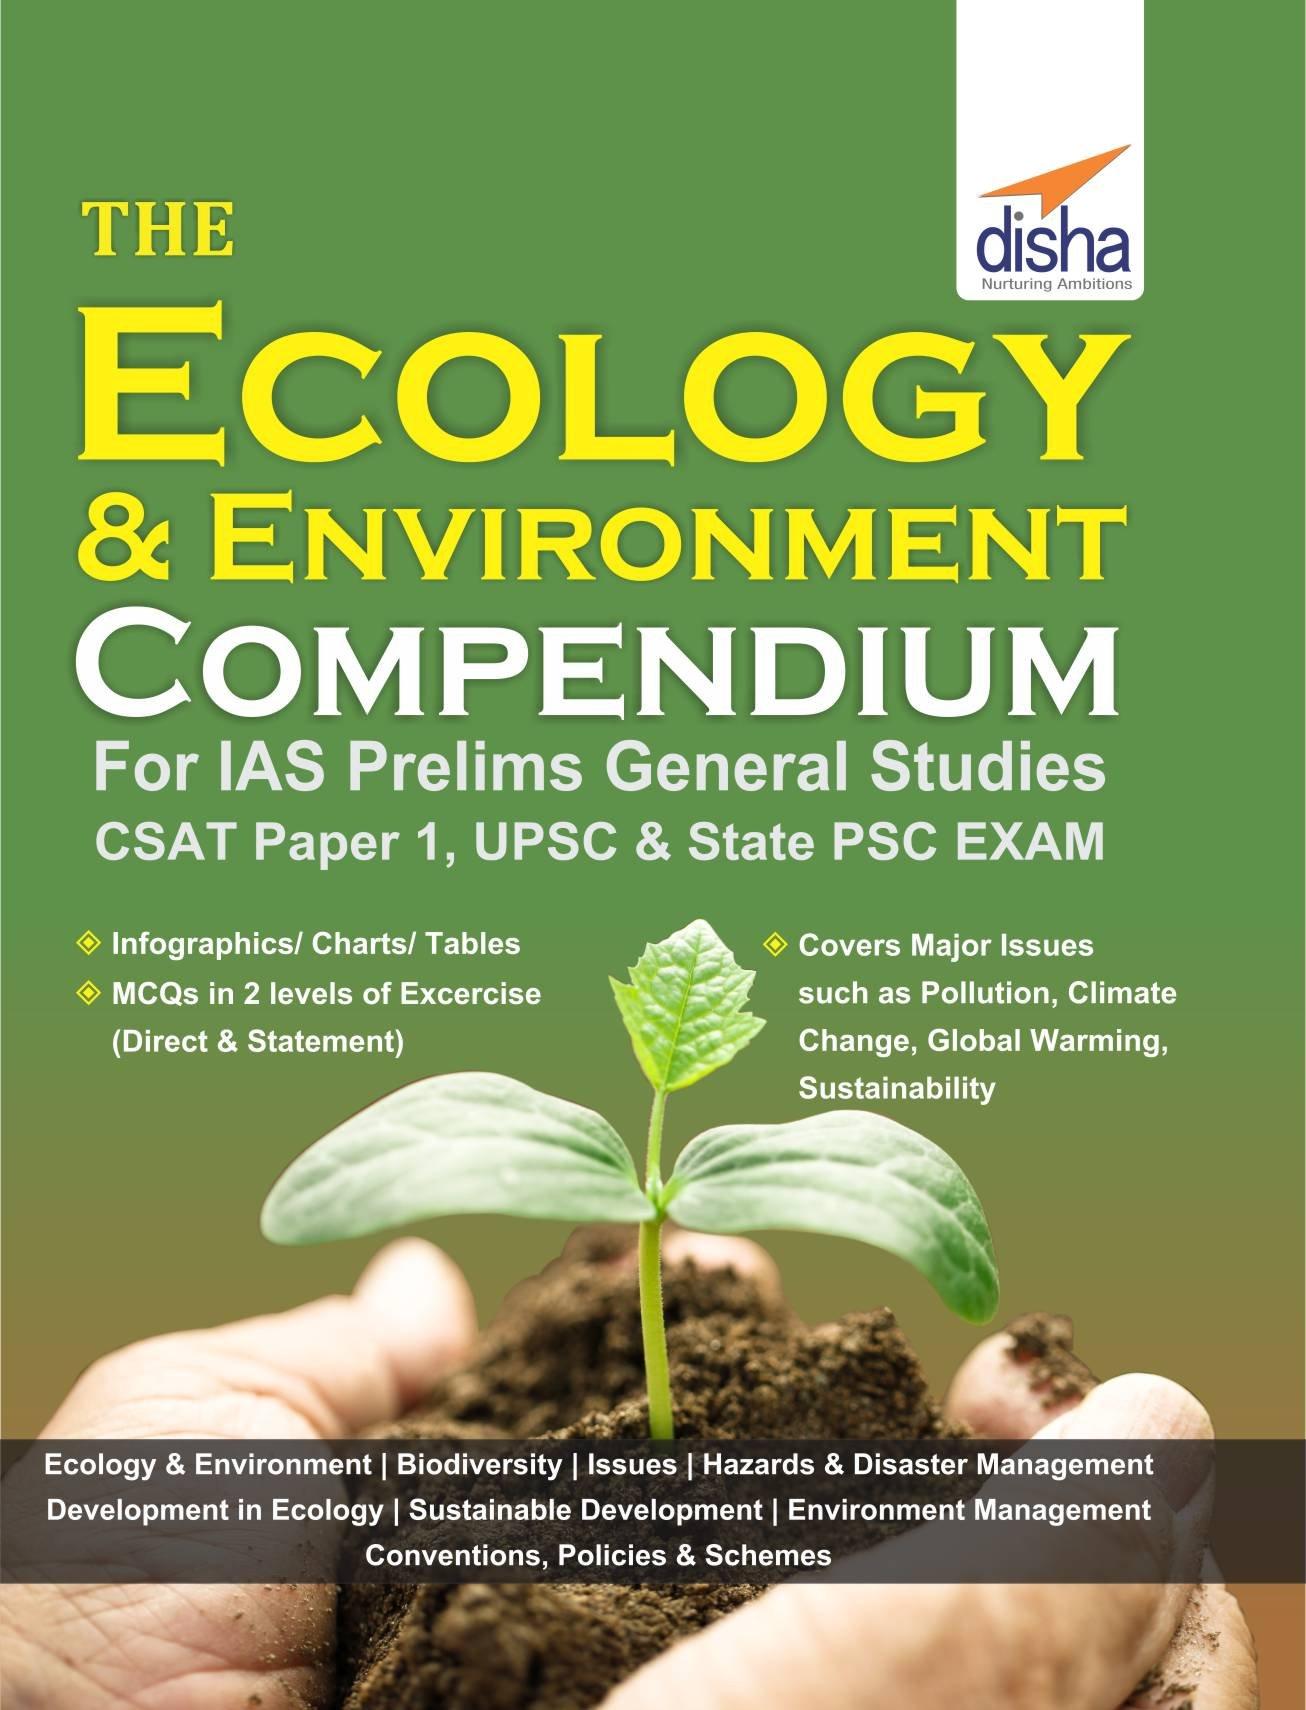 Buy The Ecology & Environment Compendium for IAS Prelims